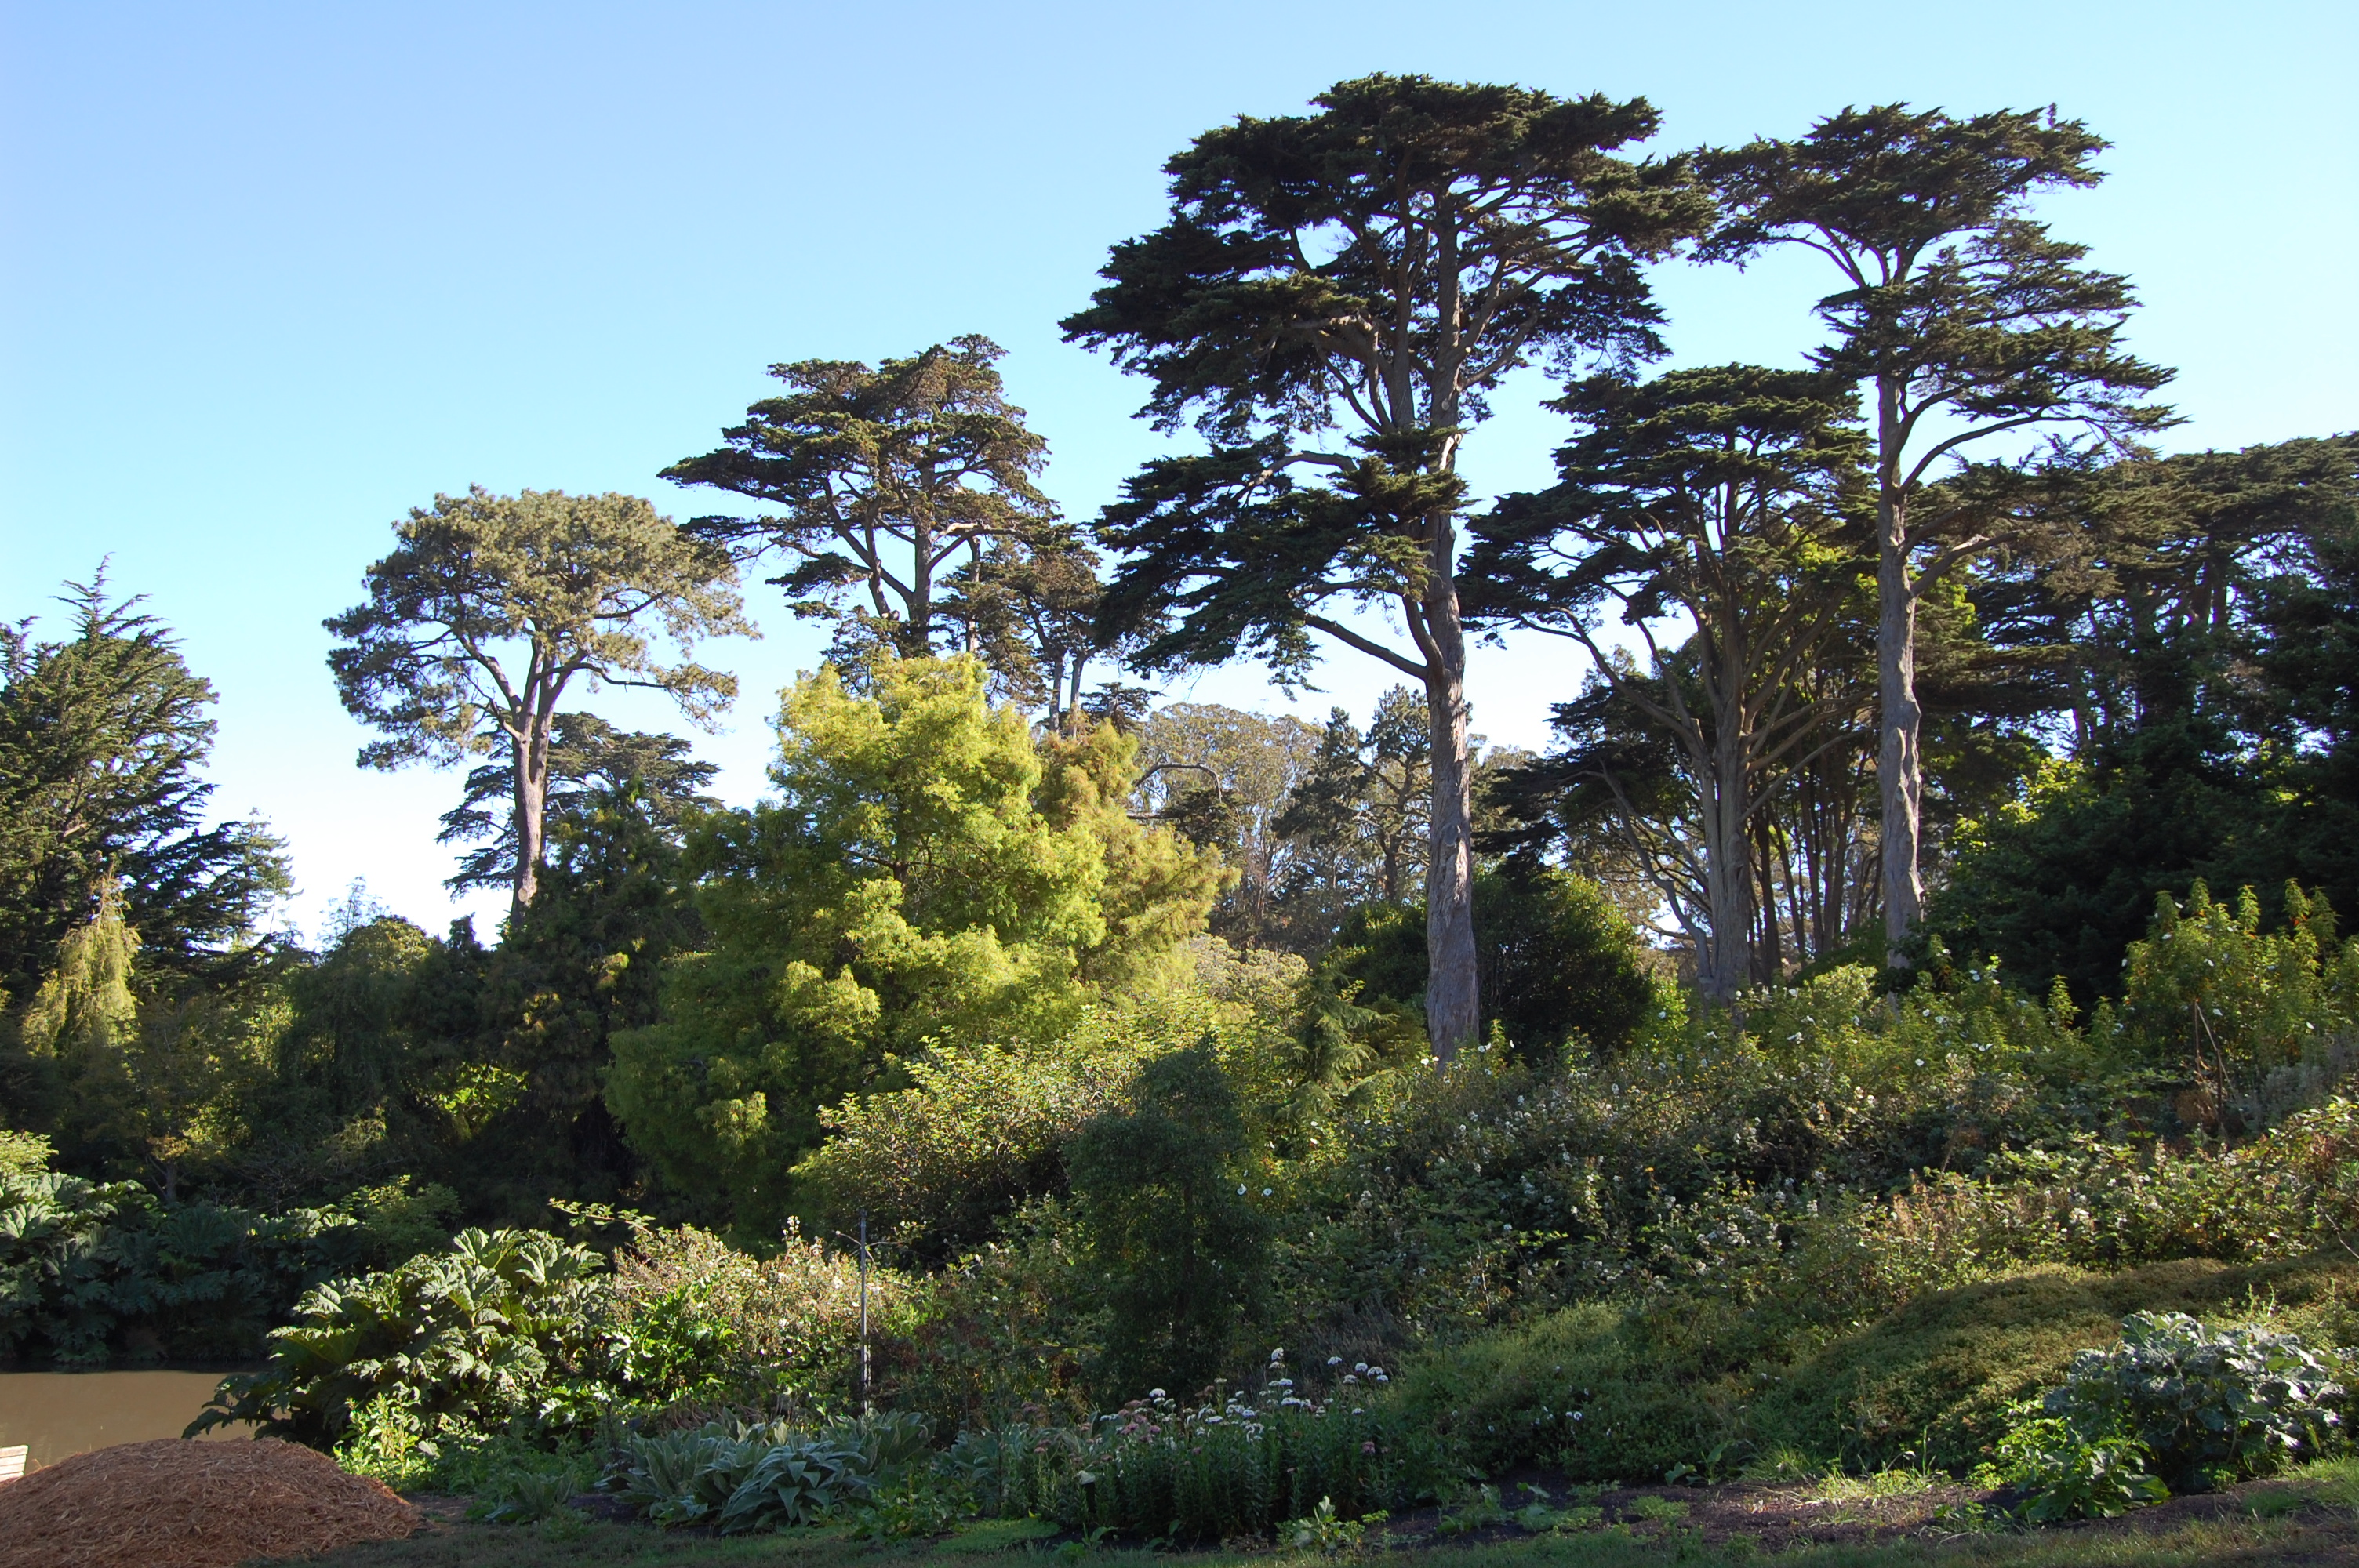 Photography workshop with saxon holt at the san francisco botanic garden gardeninacity for San francisco botanical gardens